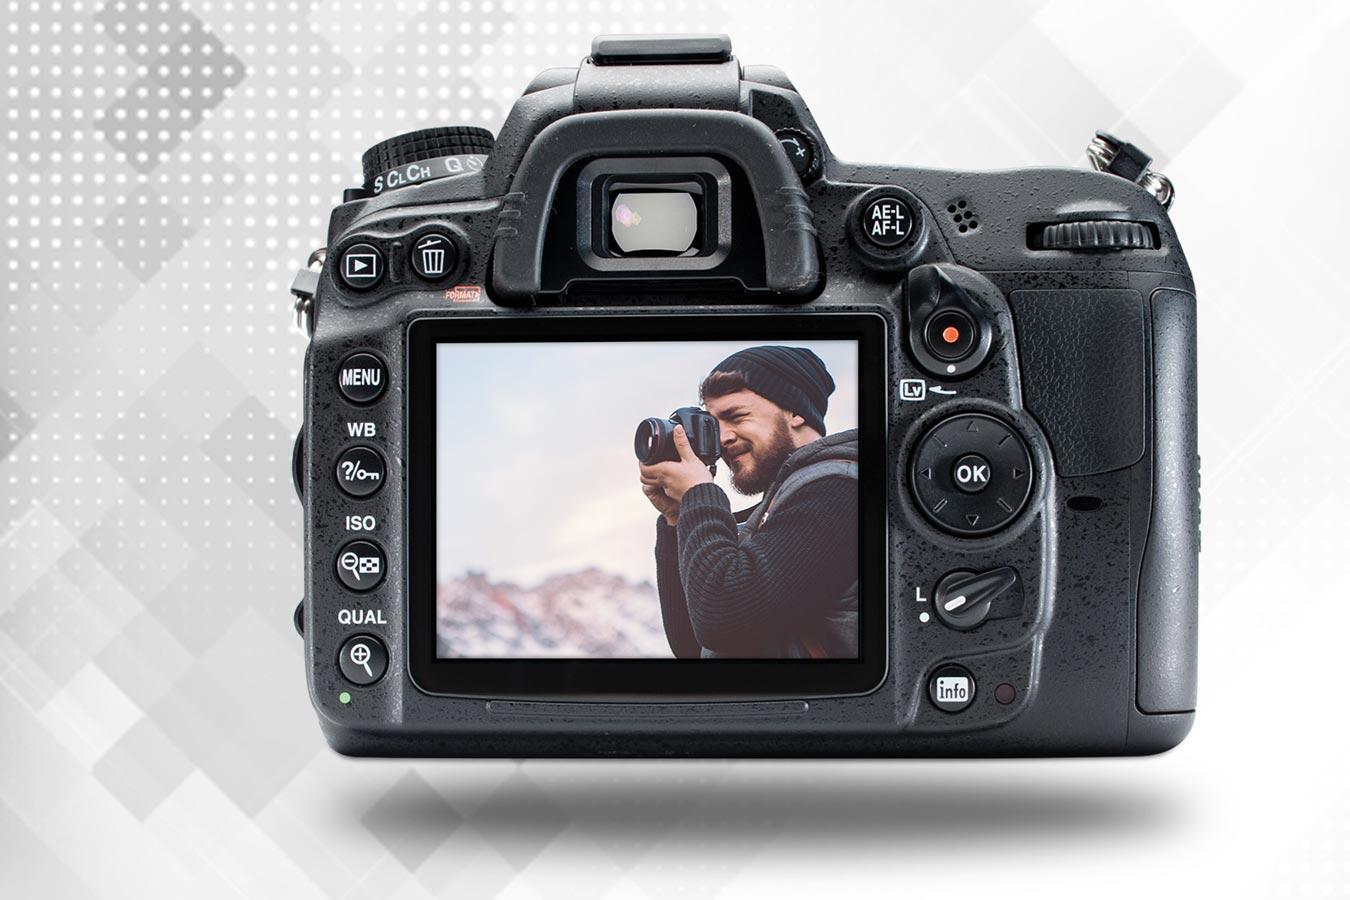 photographer - 5 تمرین ساده برای تقویت مهارت عکاسی